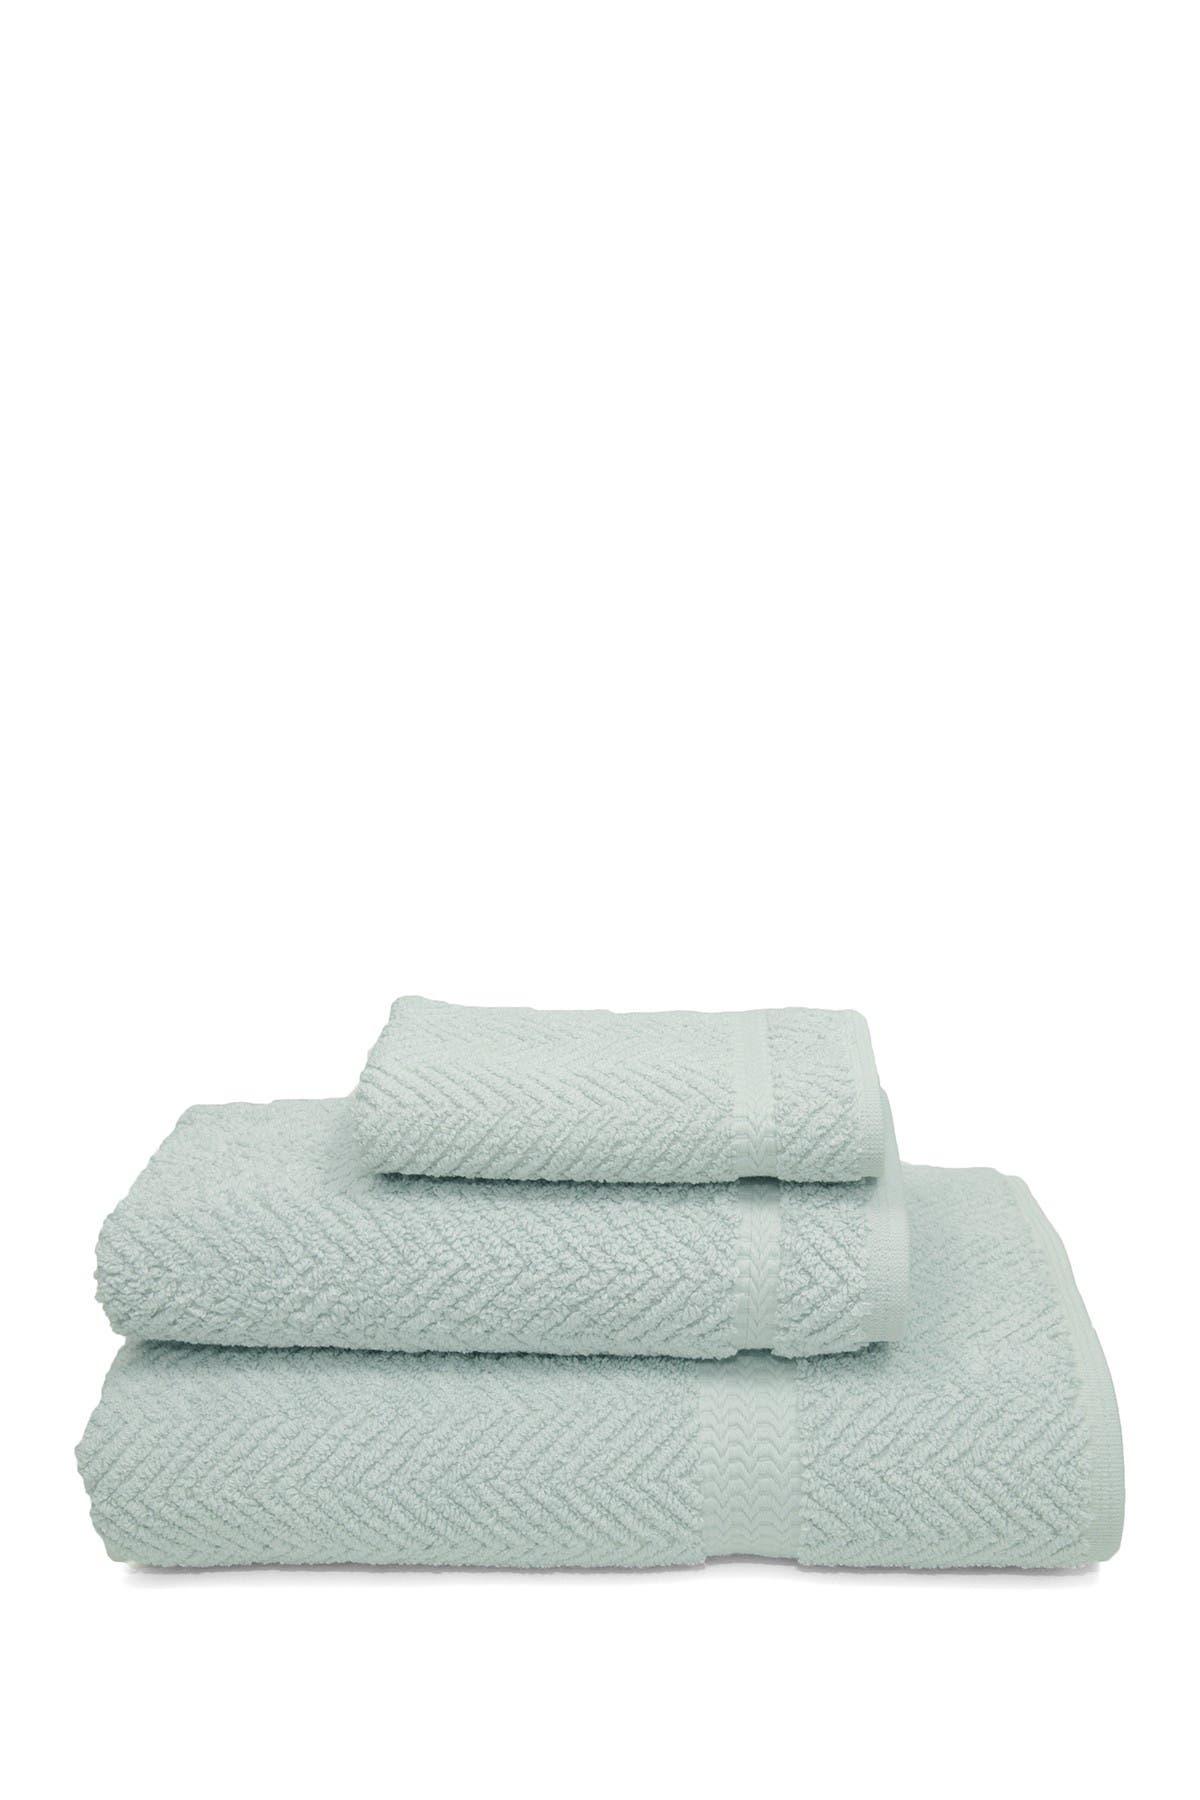 Linum Home Aqua Blue Herringbone 3 Piece Towel Set Nordstrom Rack